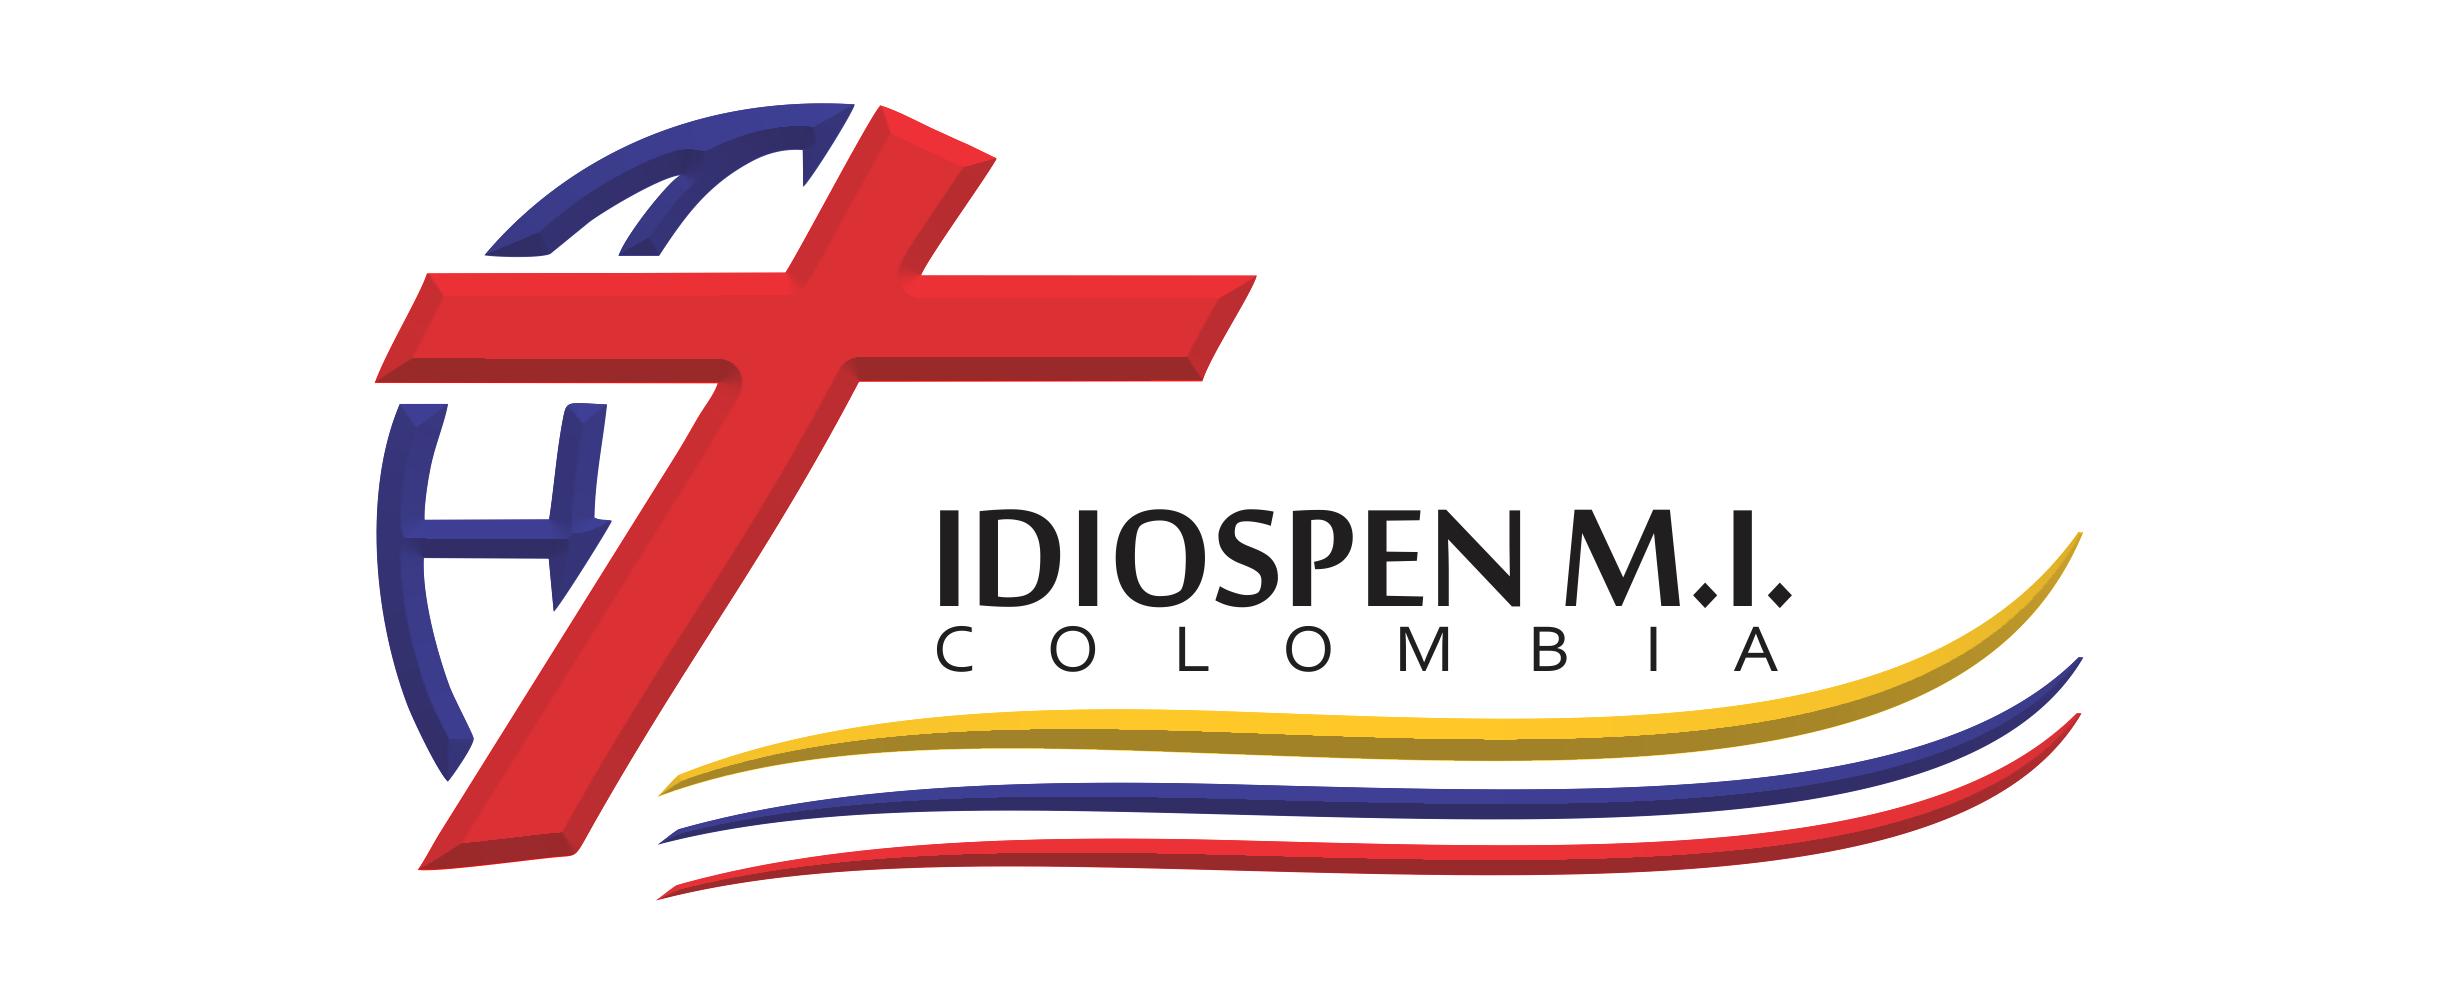 IDDPMI COLOMBIA RCS